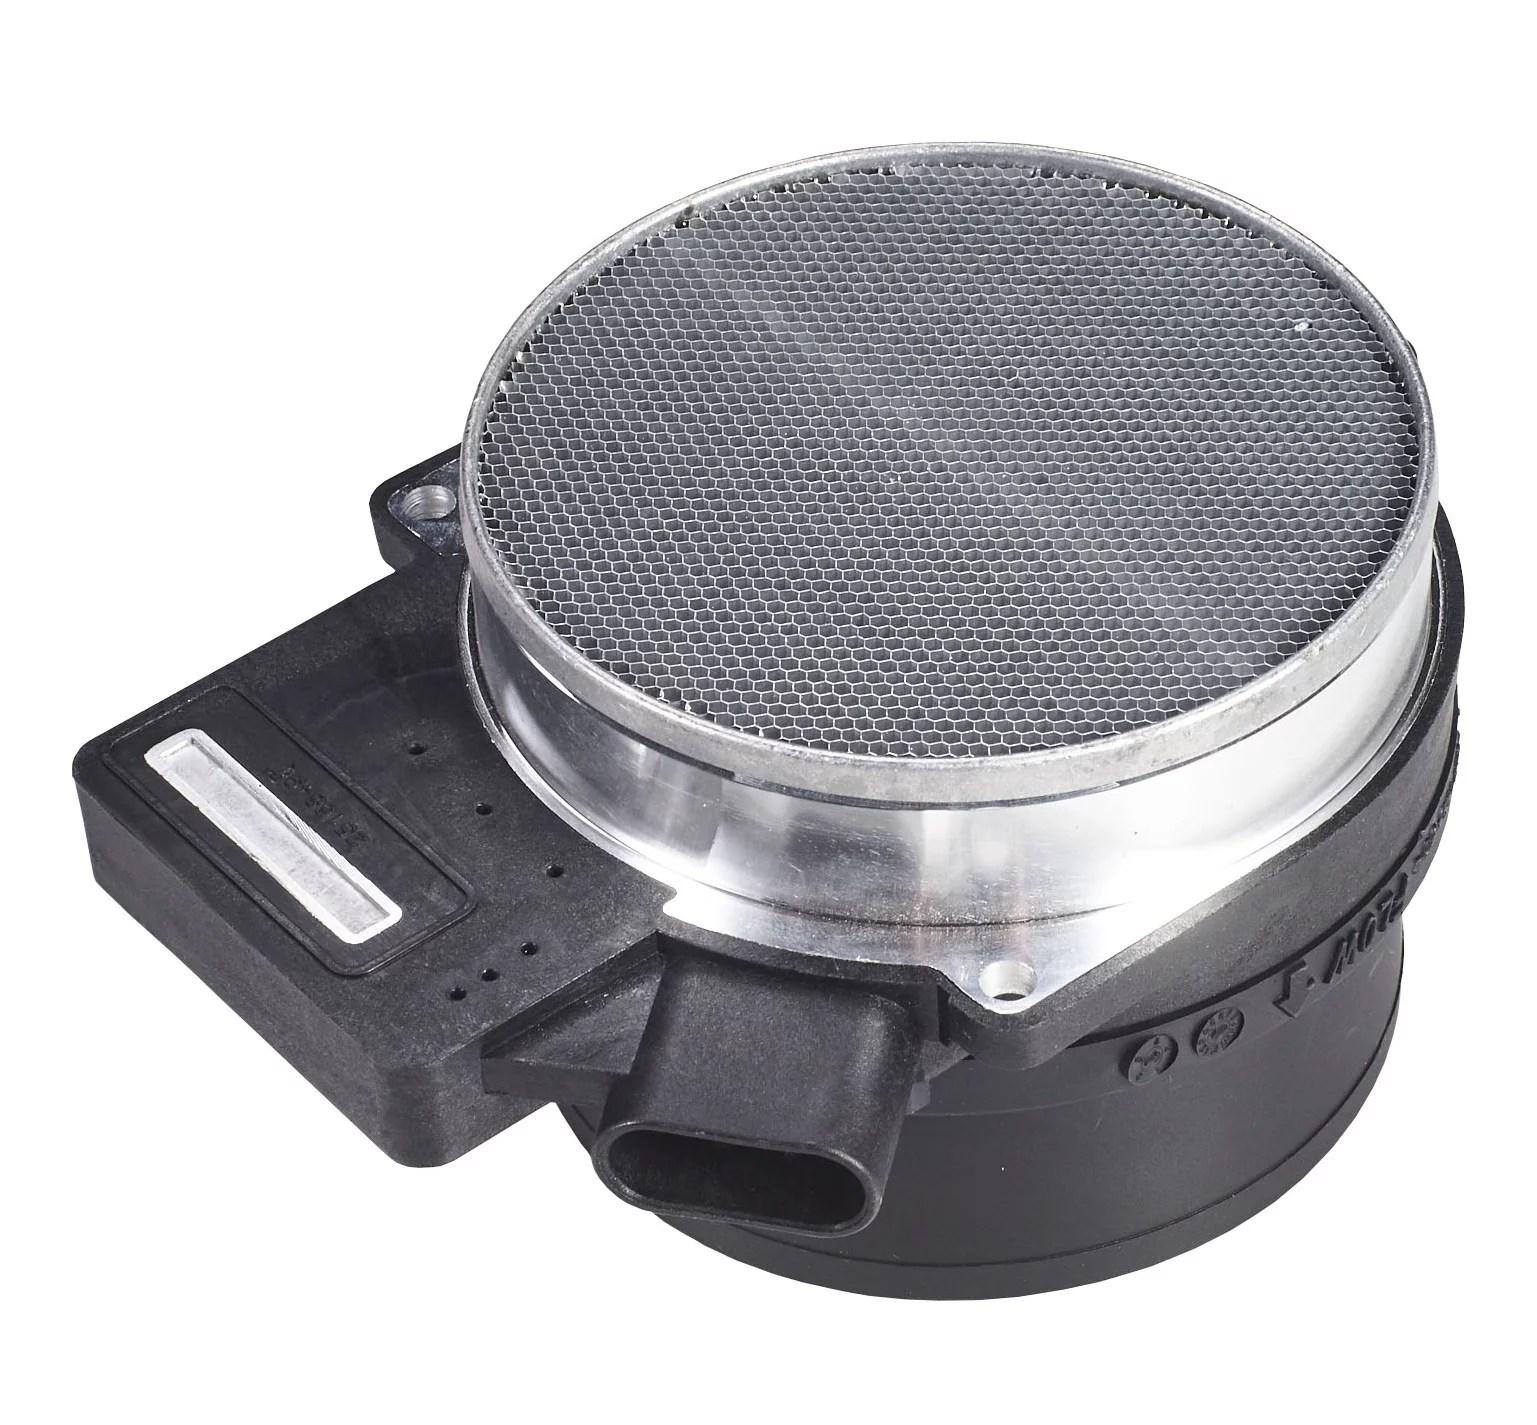 hight resolution of for 2003 chevrolet suburban 2500 v8 6 0l 8 1l mass air flow sensor gsxf walmart com